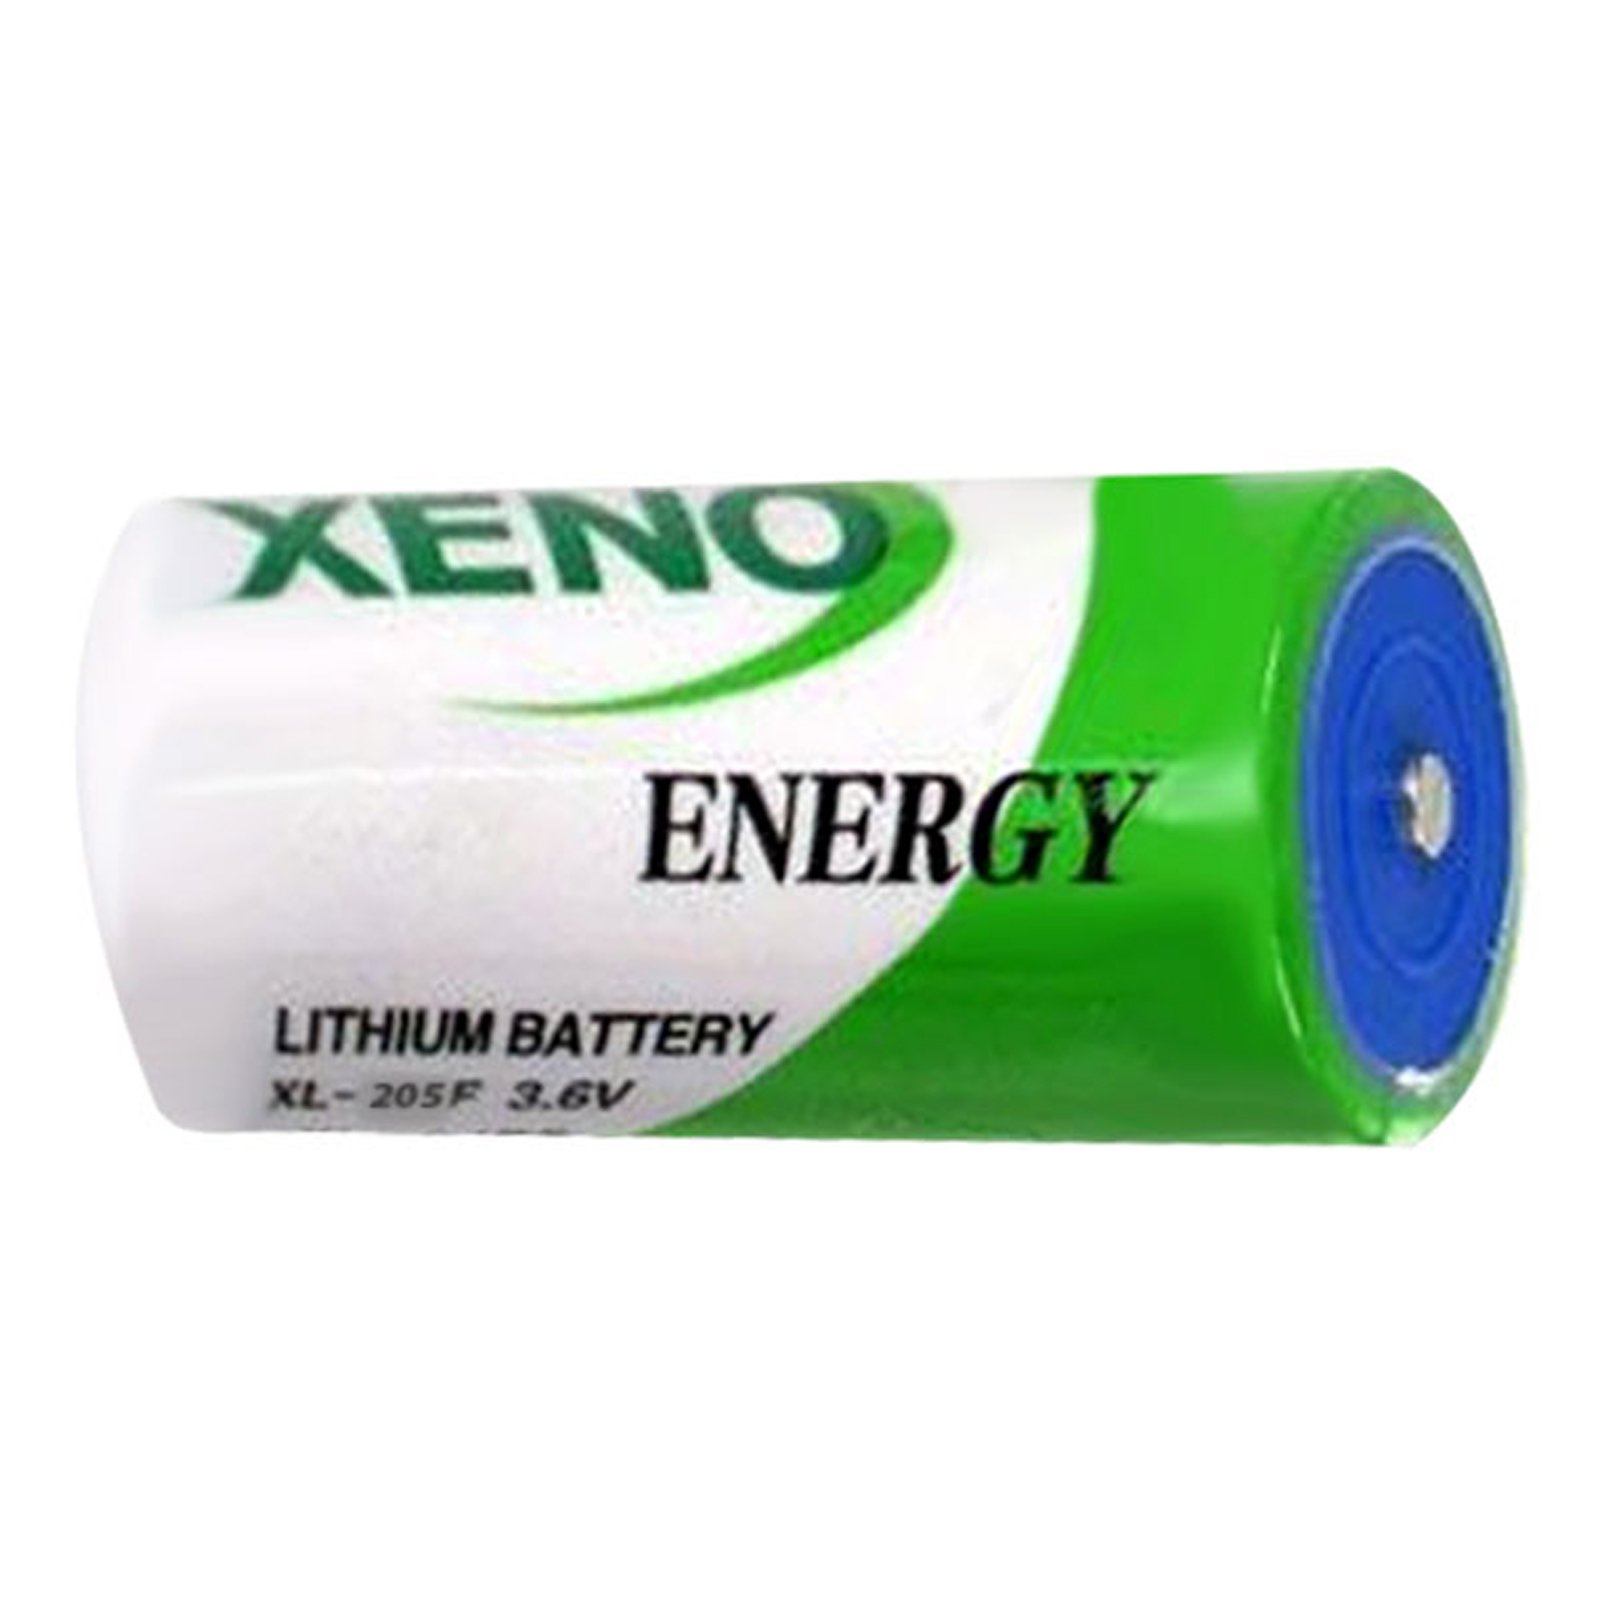 Xeno XL-205F D STD 3.6V Lithium Thionyl Chloride Battery